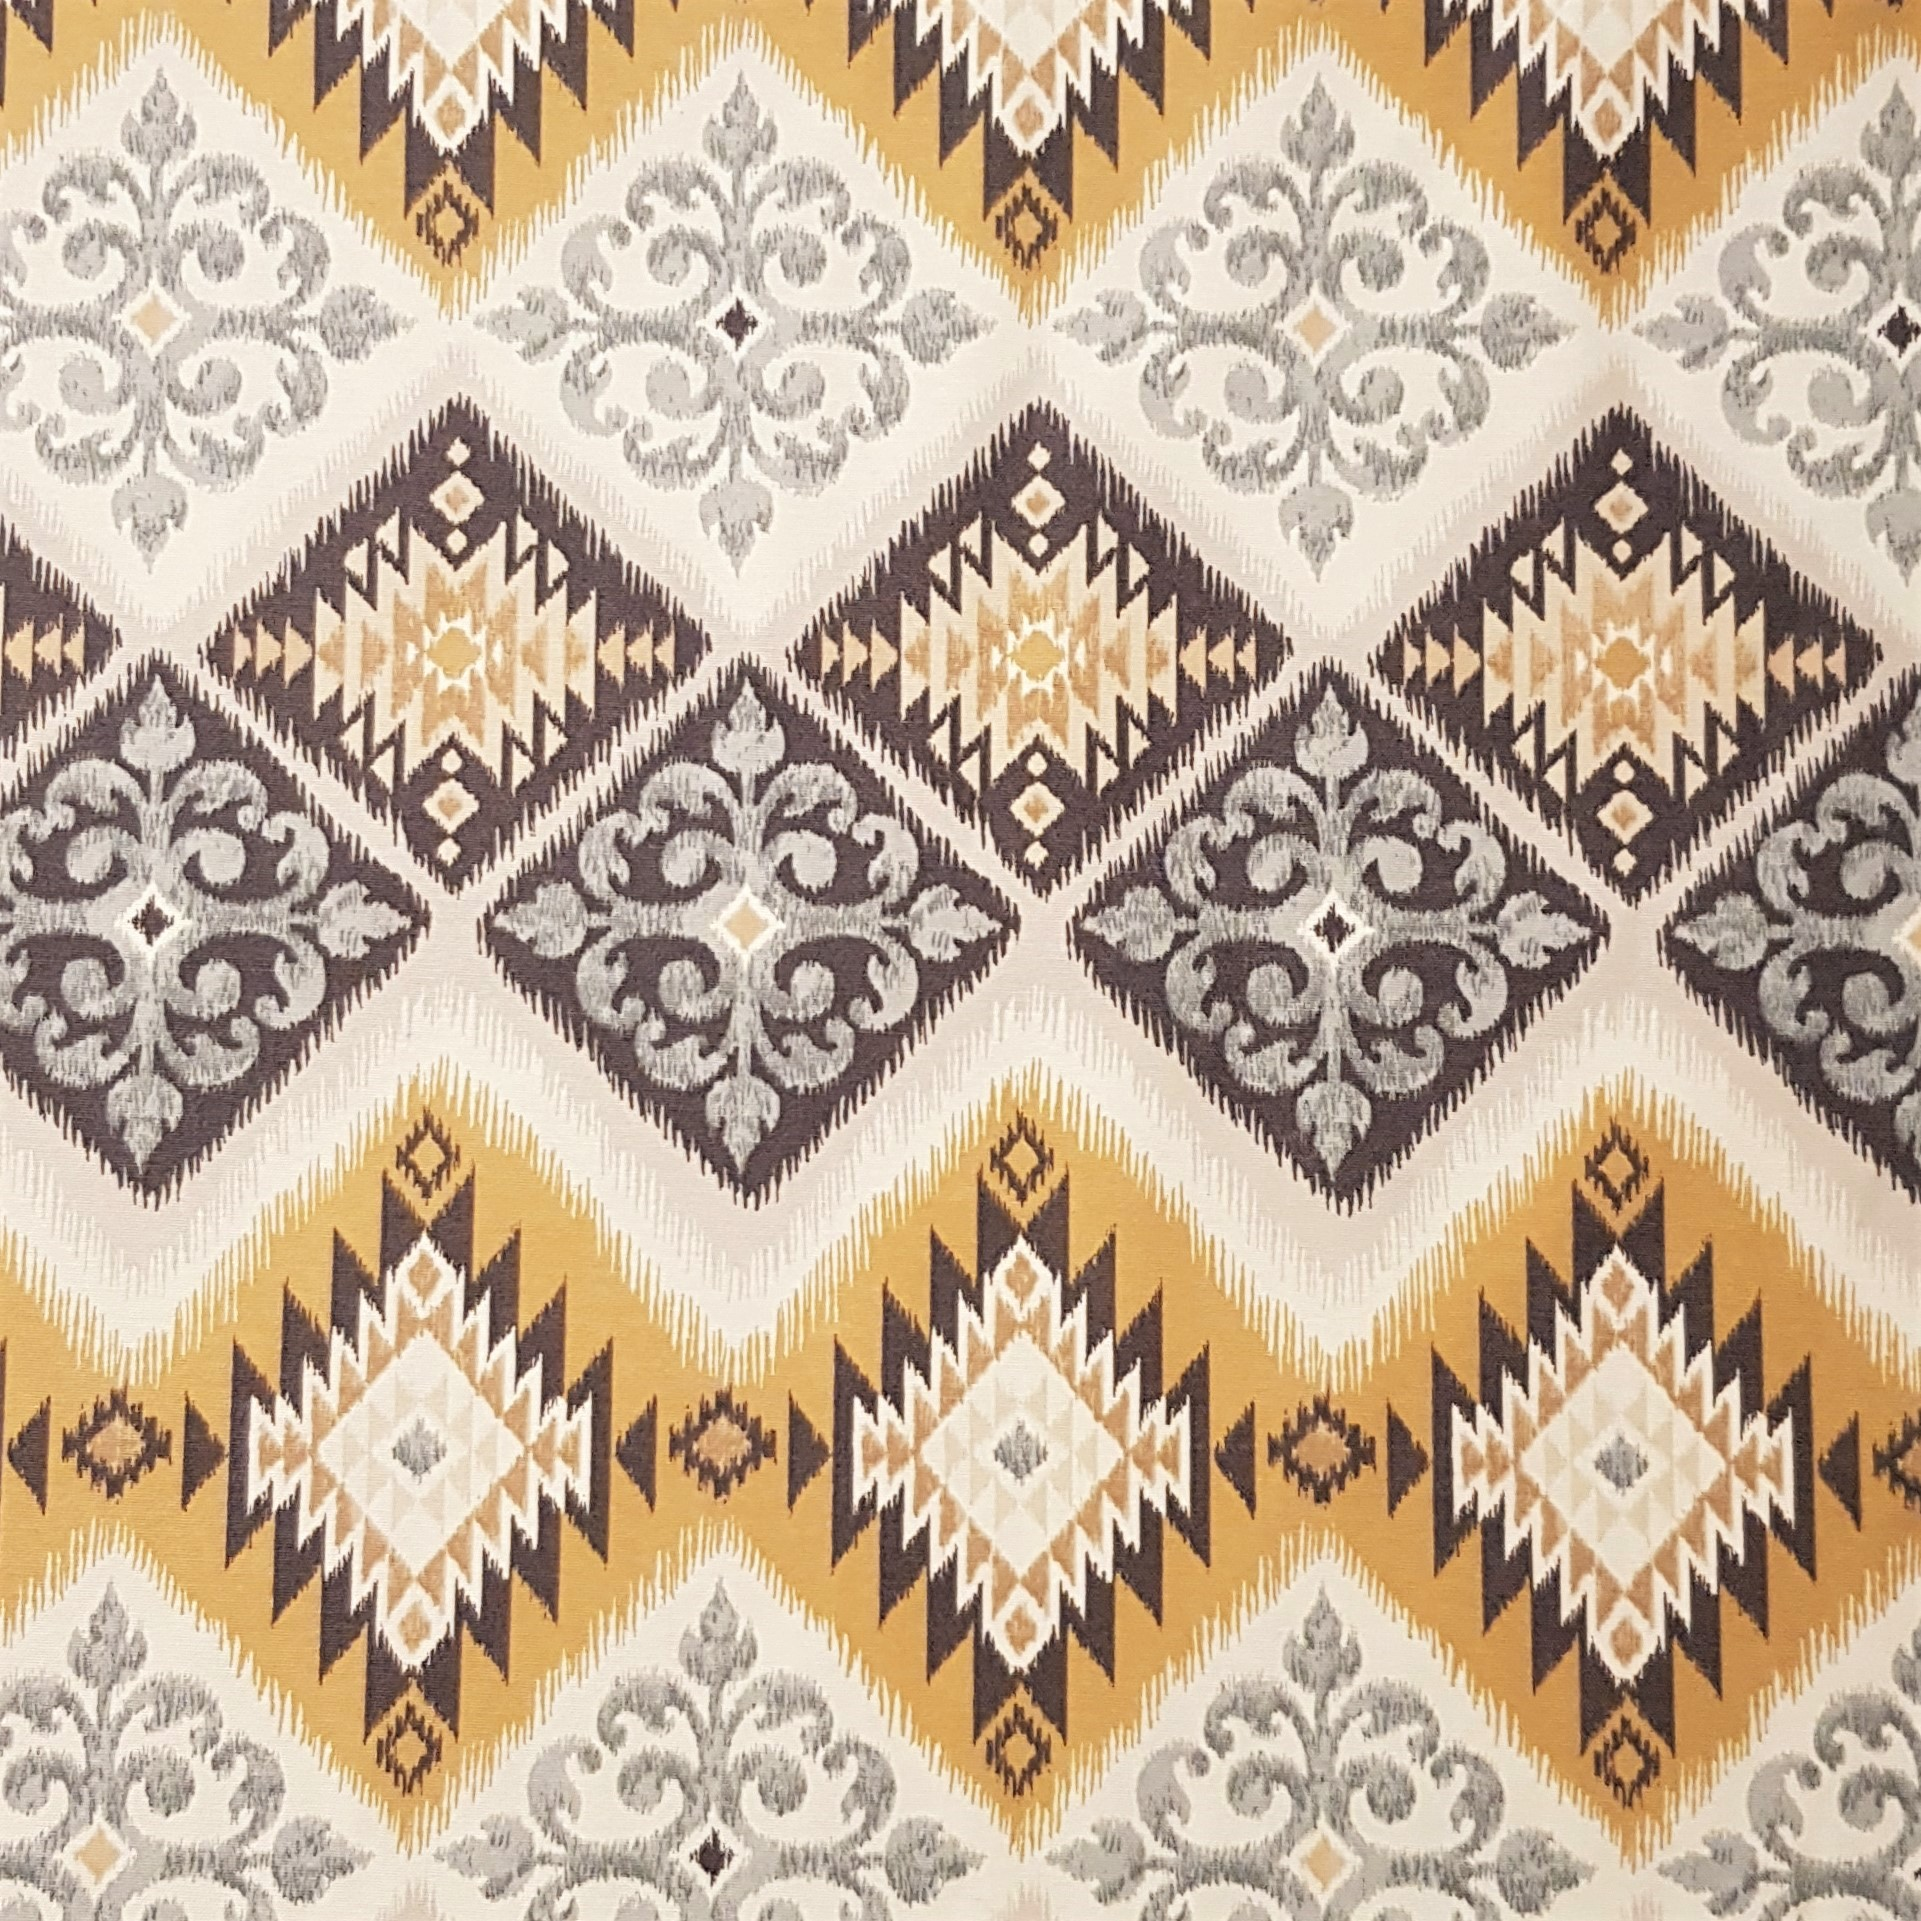 Mantel KILIMGRIS Rectangular 1,5x2,4m [enstockpara envíooretiro]